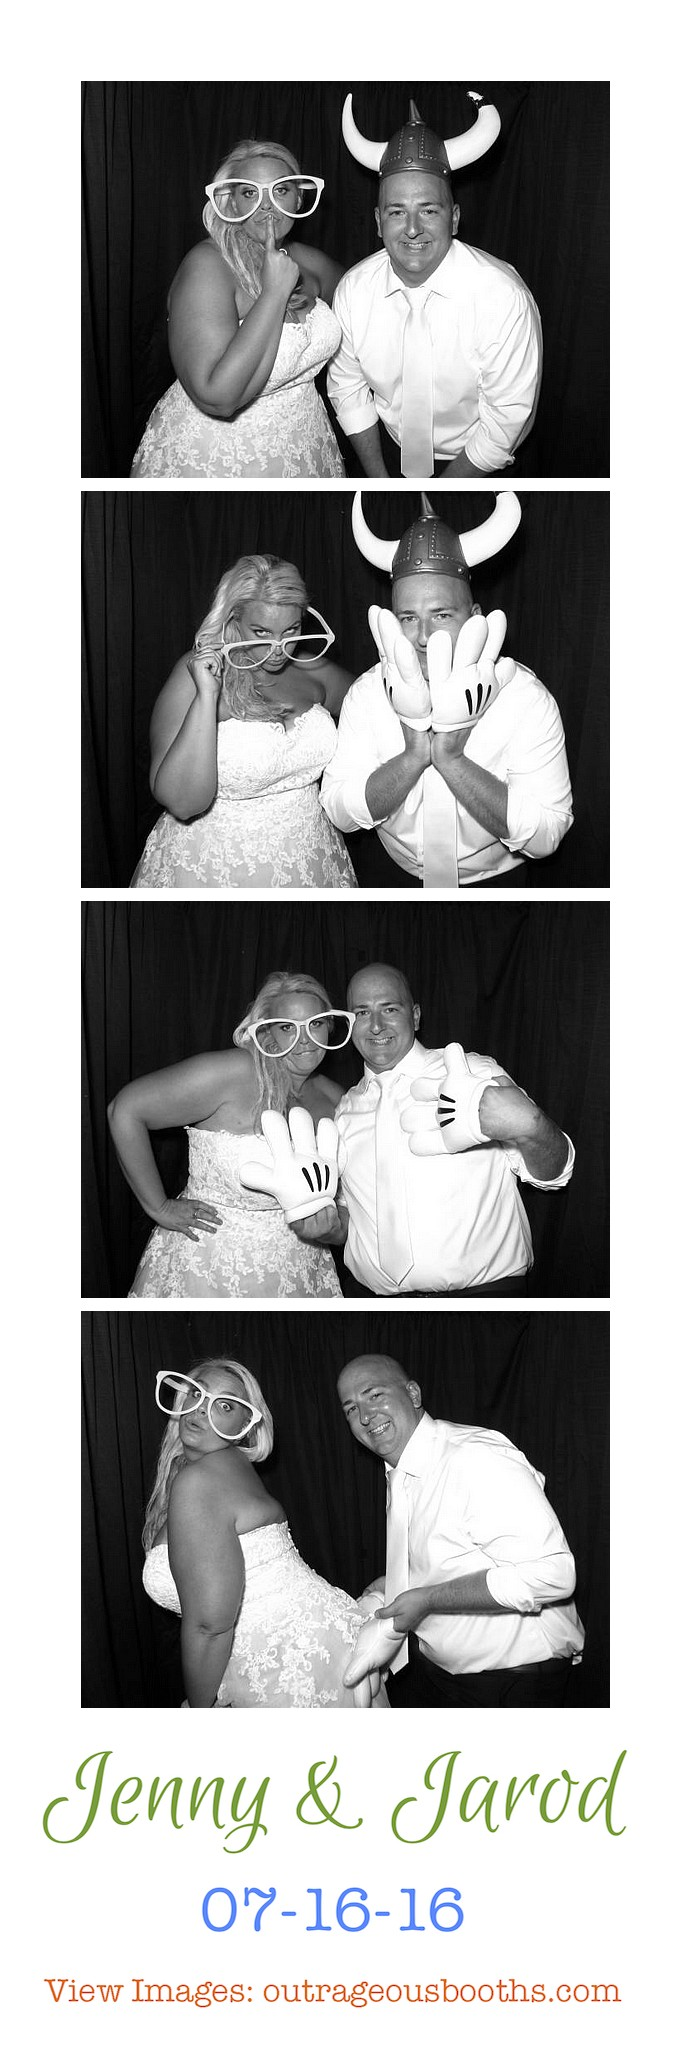 07-16-16 Jenny & Jarod